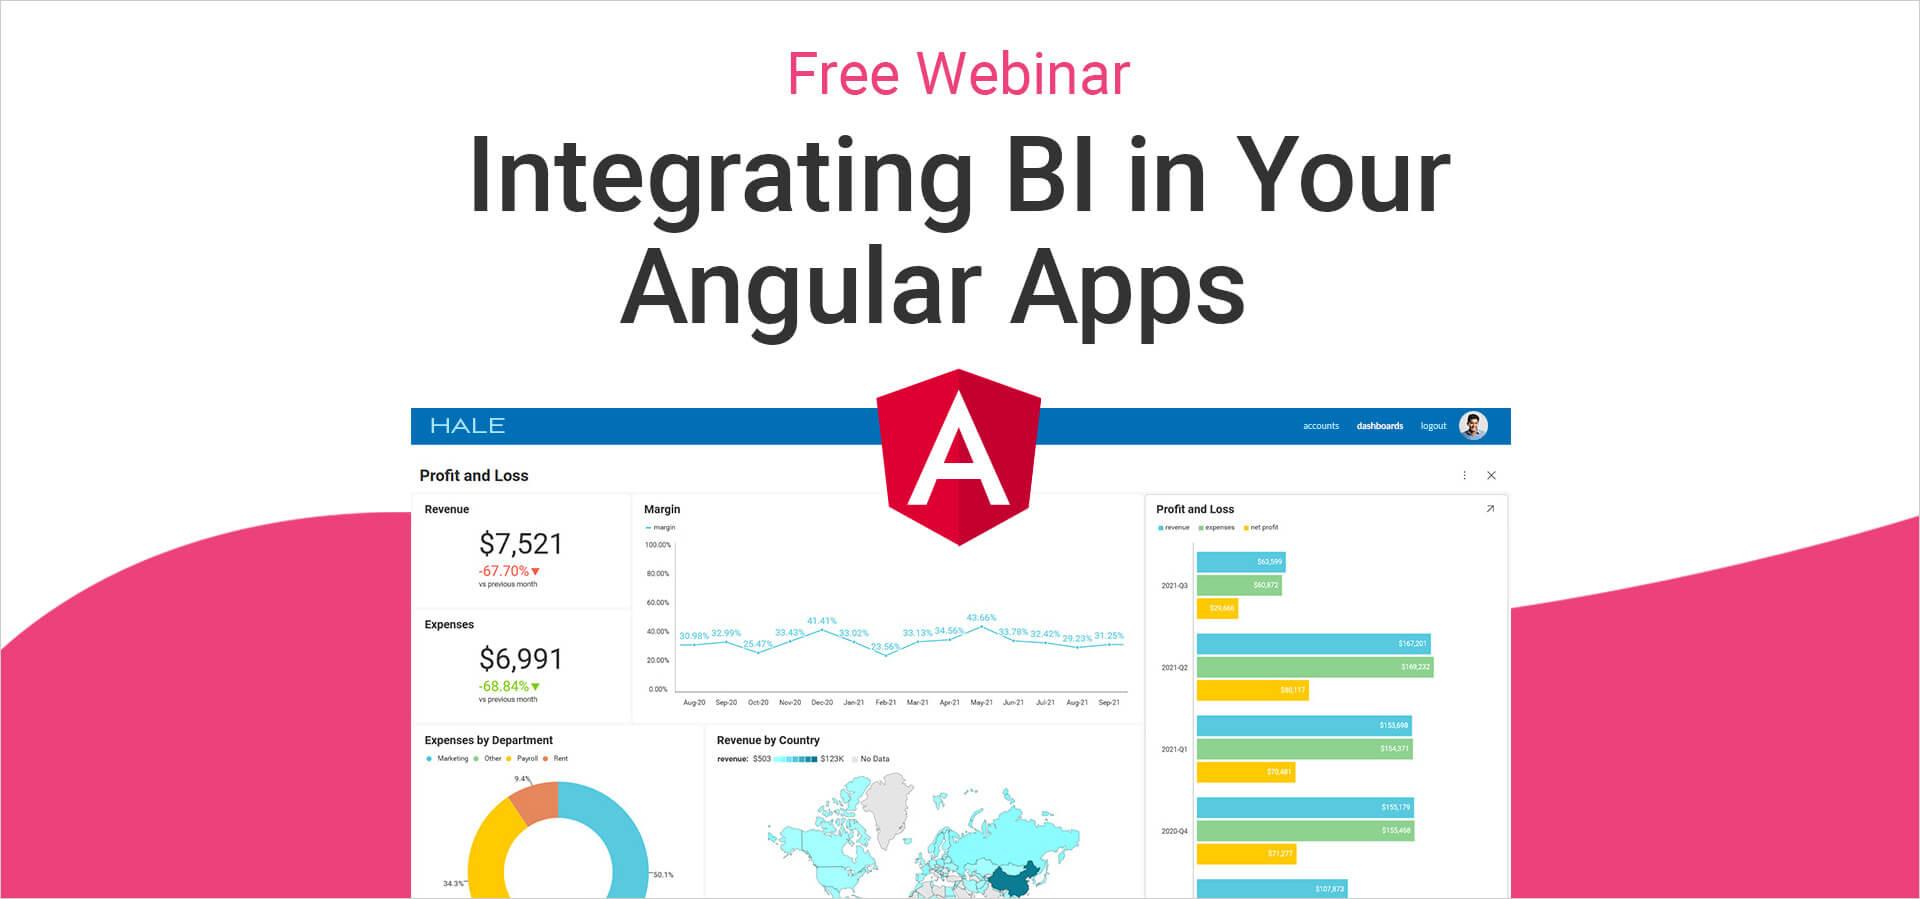 Integrating BI in Your Angular Apps